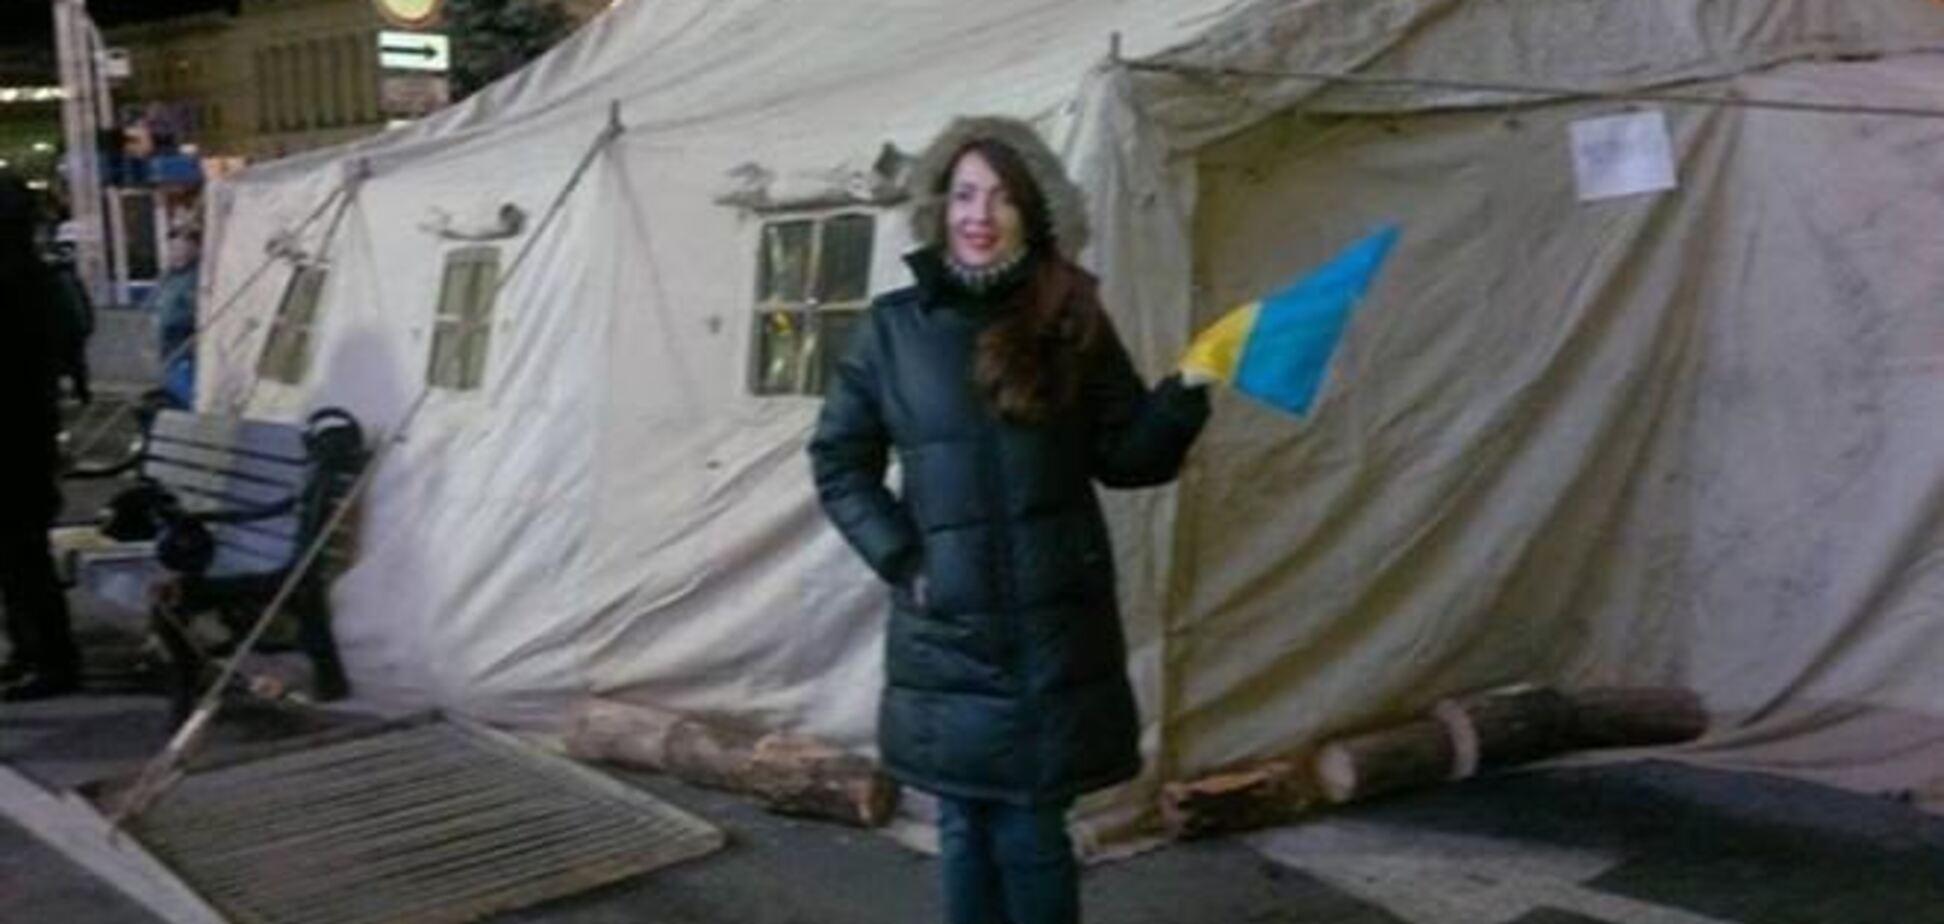 Звезда шоу 'Богатые тоже плачут' поддержала Евромайдан